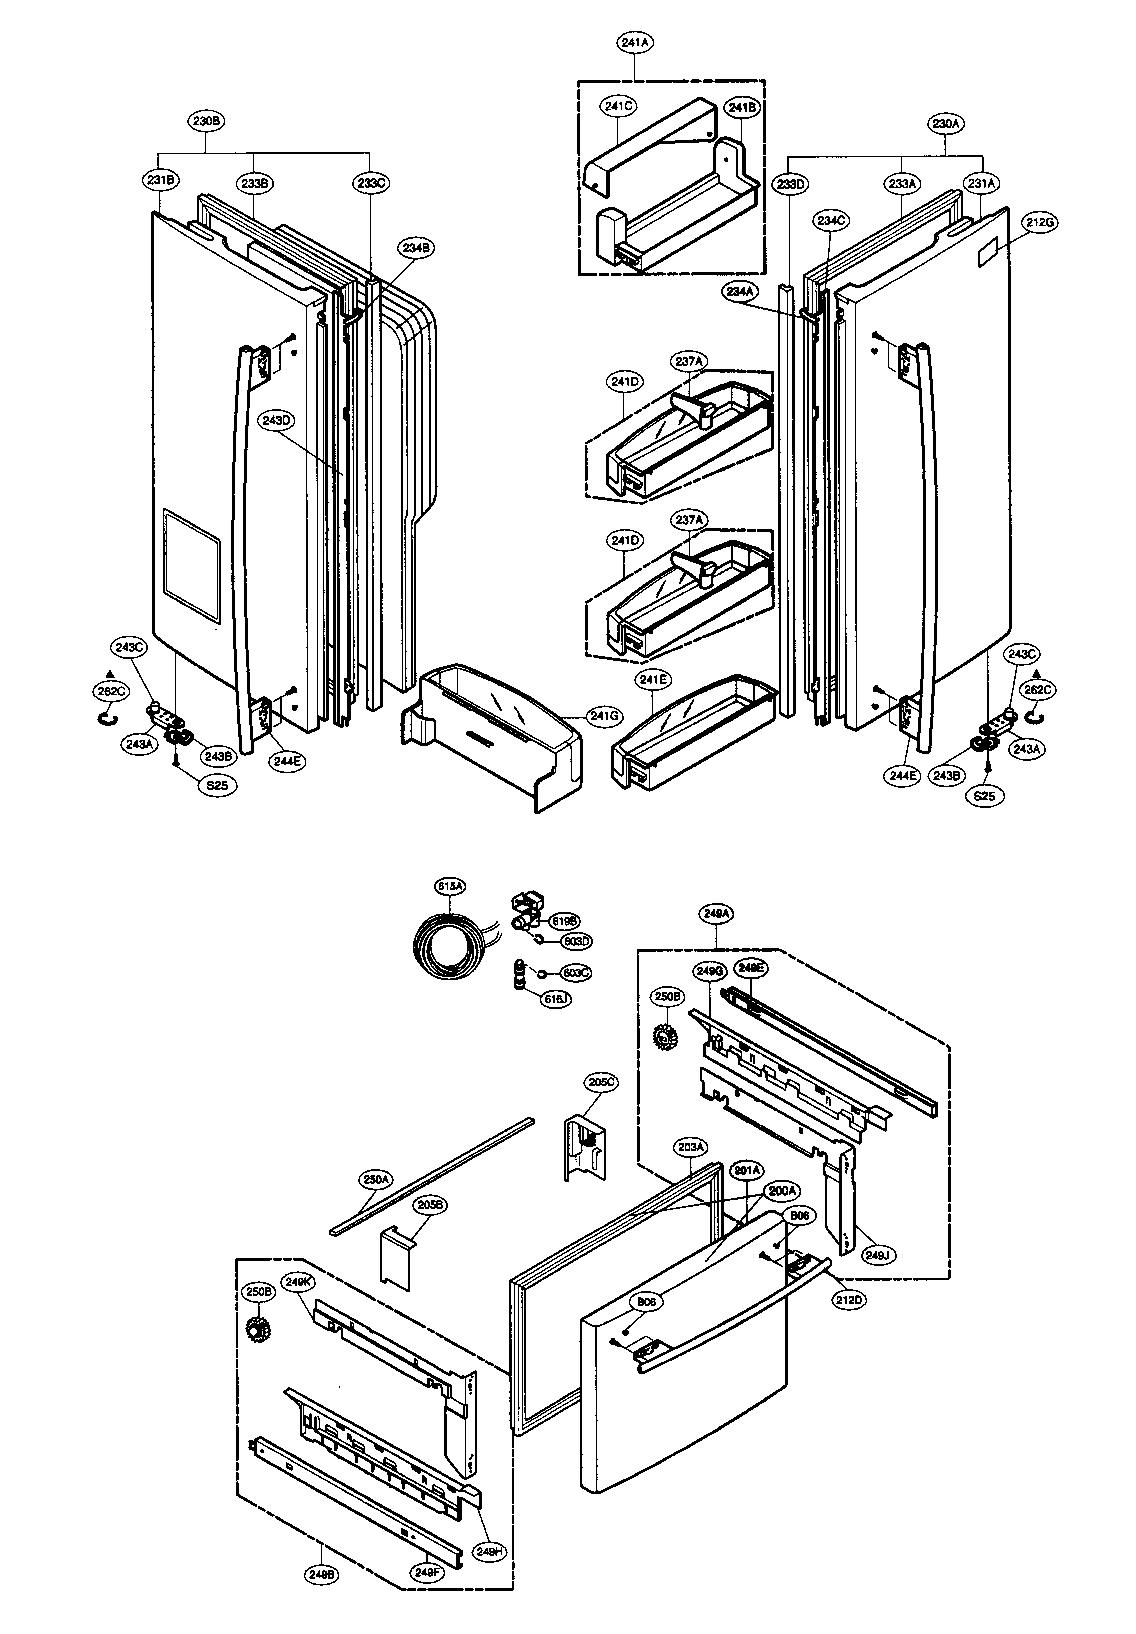 Wiring Diagram: 28 Lg Lfx28978st Parts Diagram